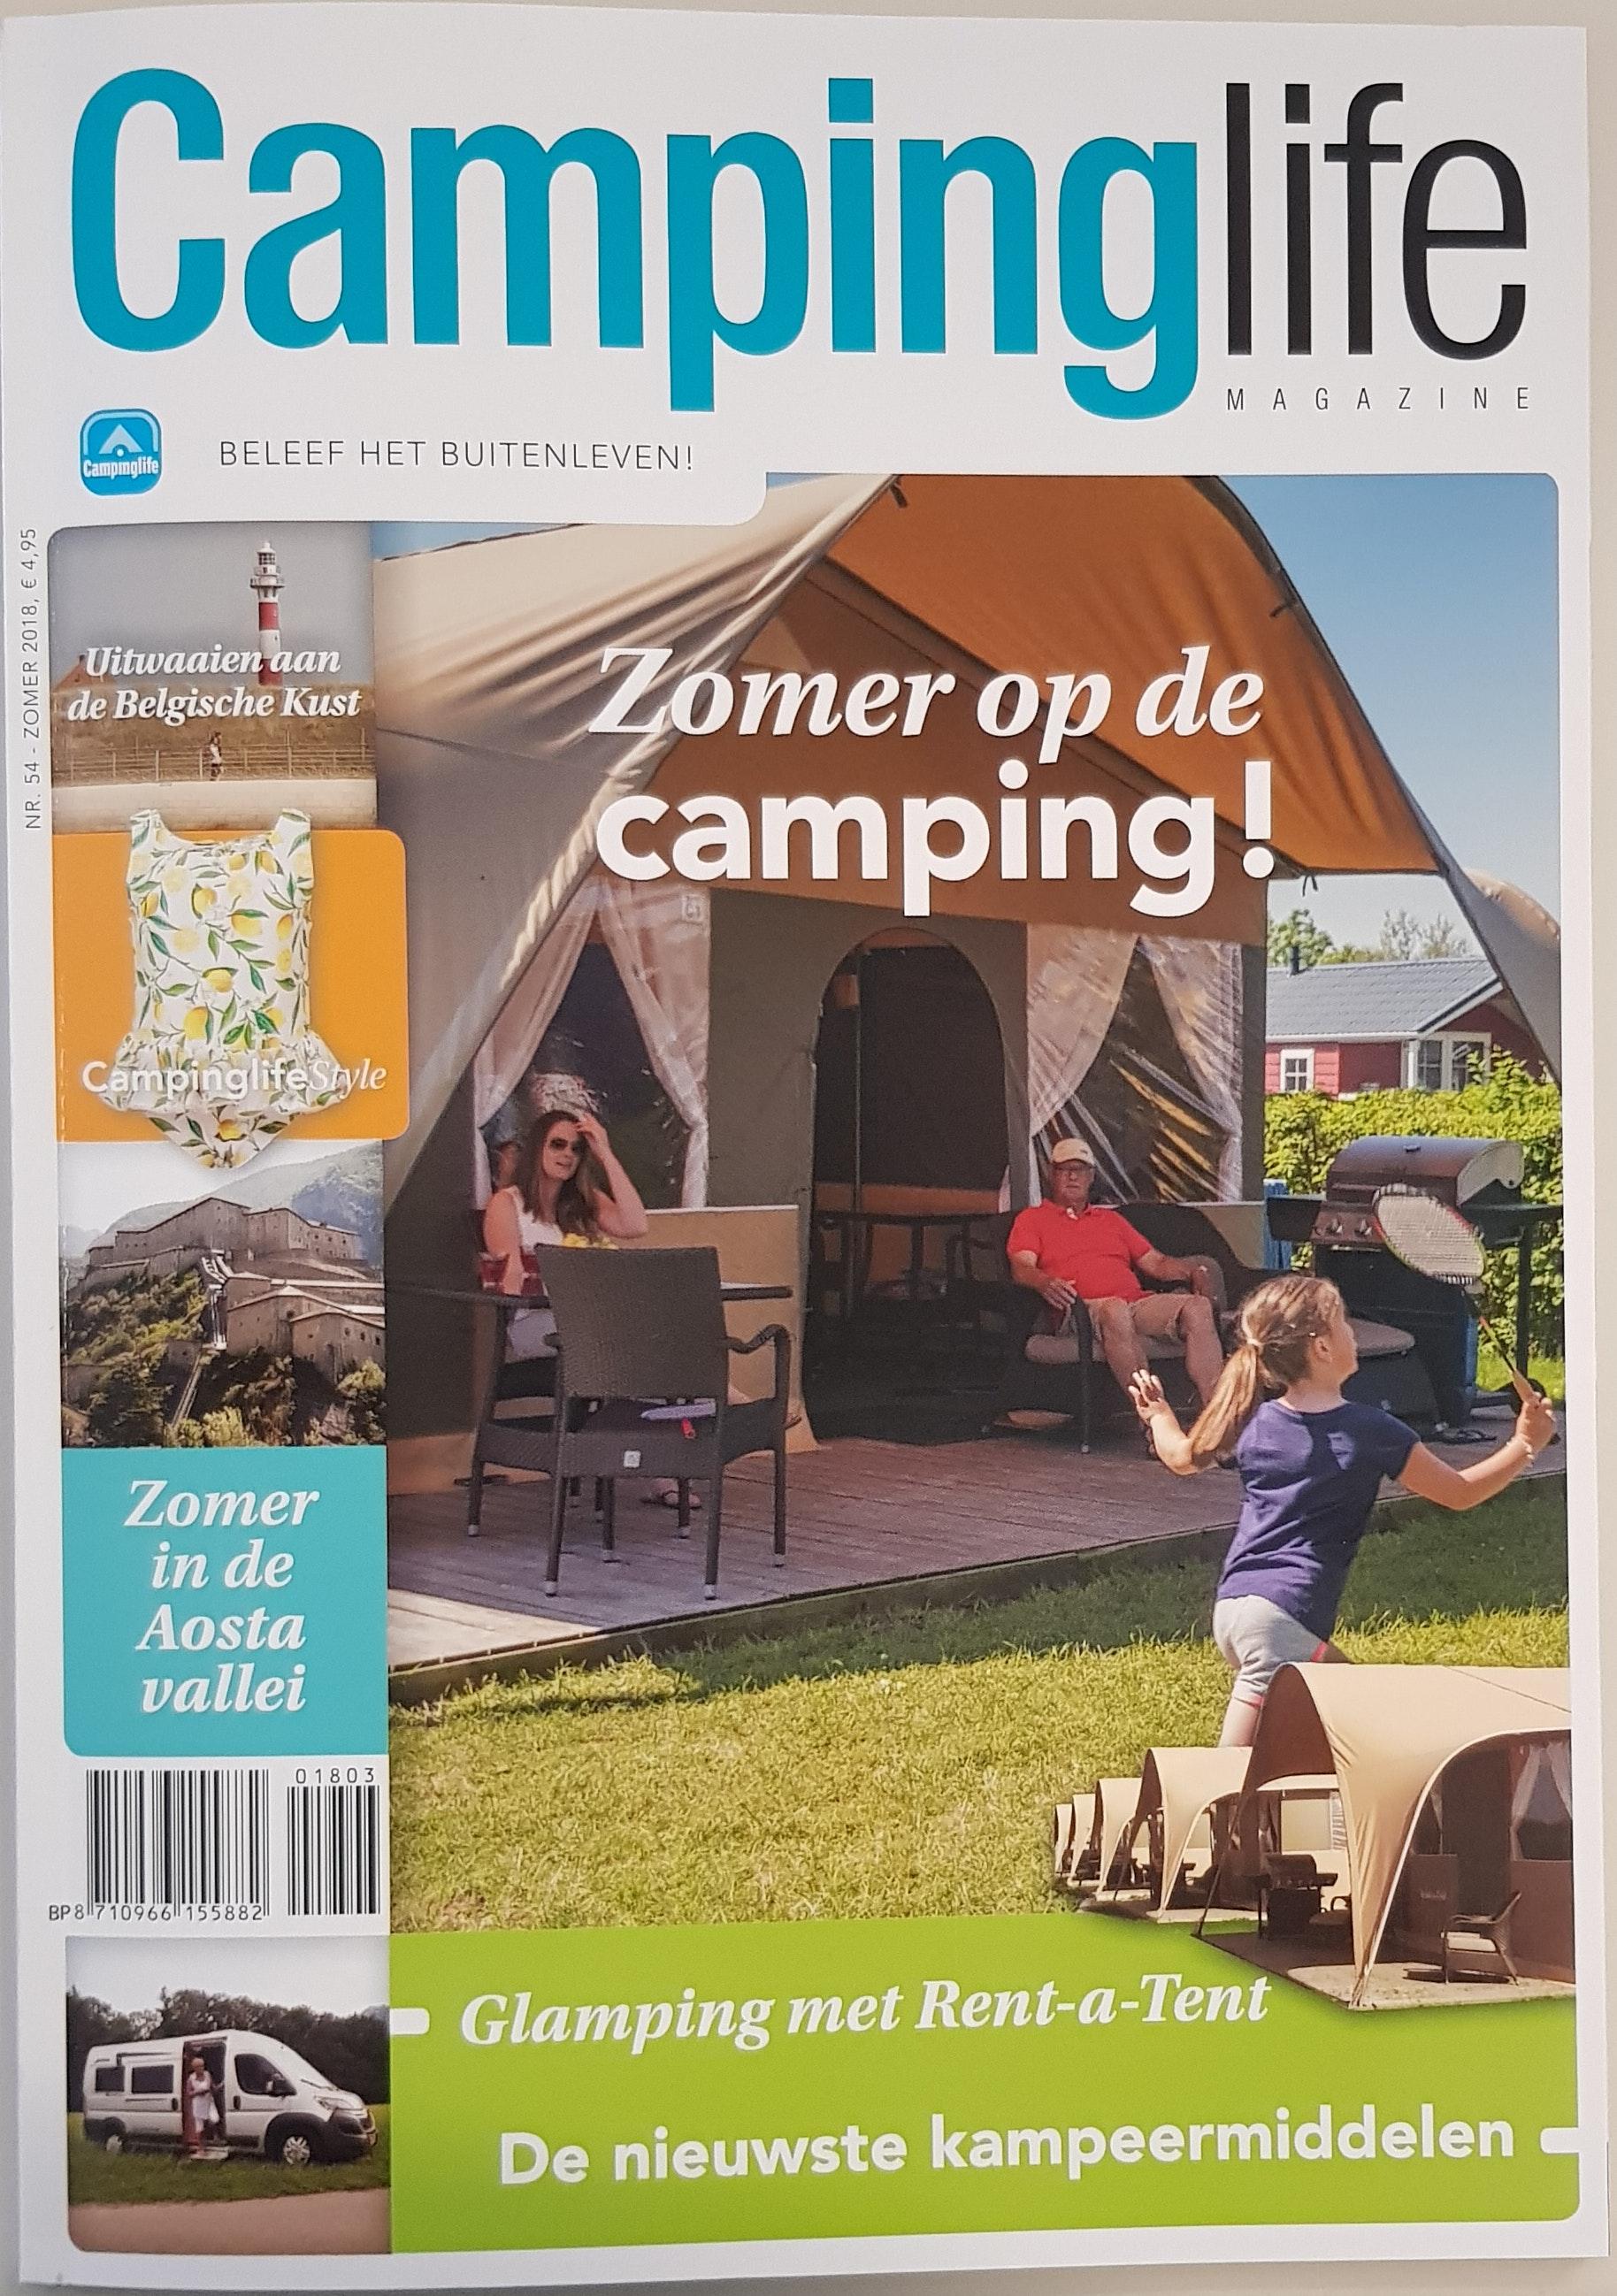 Campinglife zomer 2018 cover